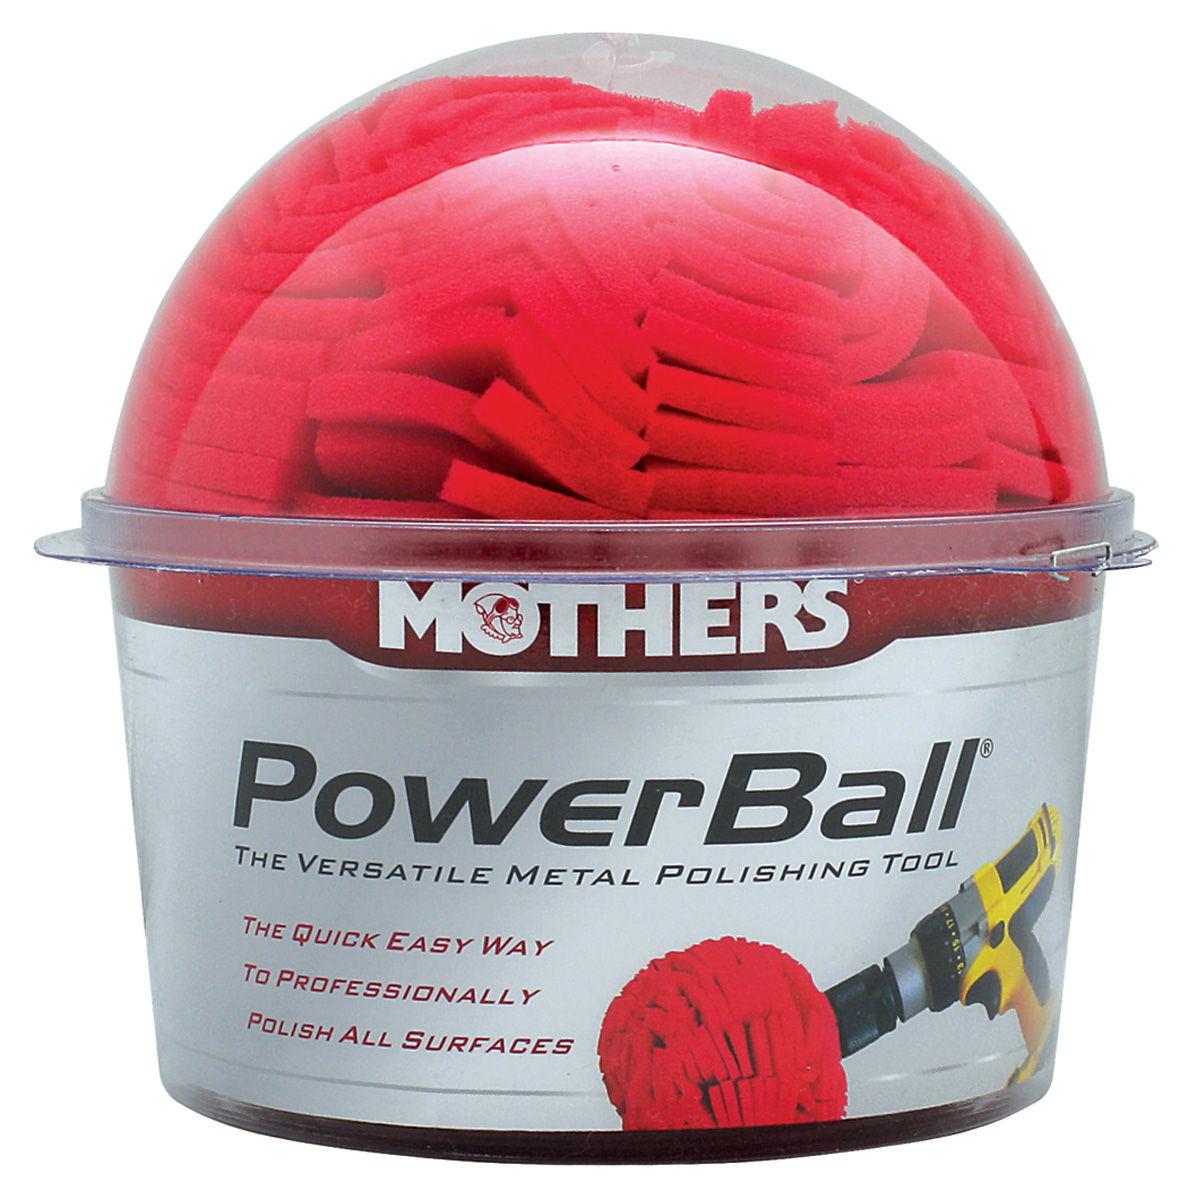 Photo of PowerBall Polisher